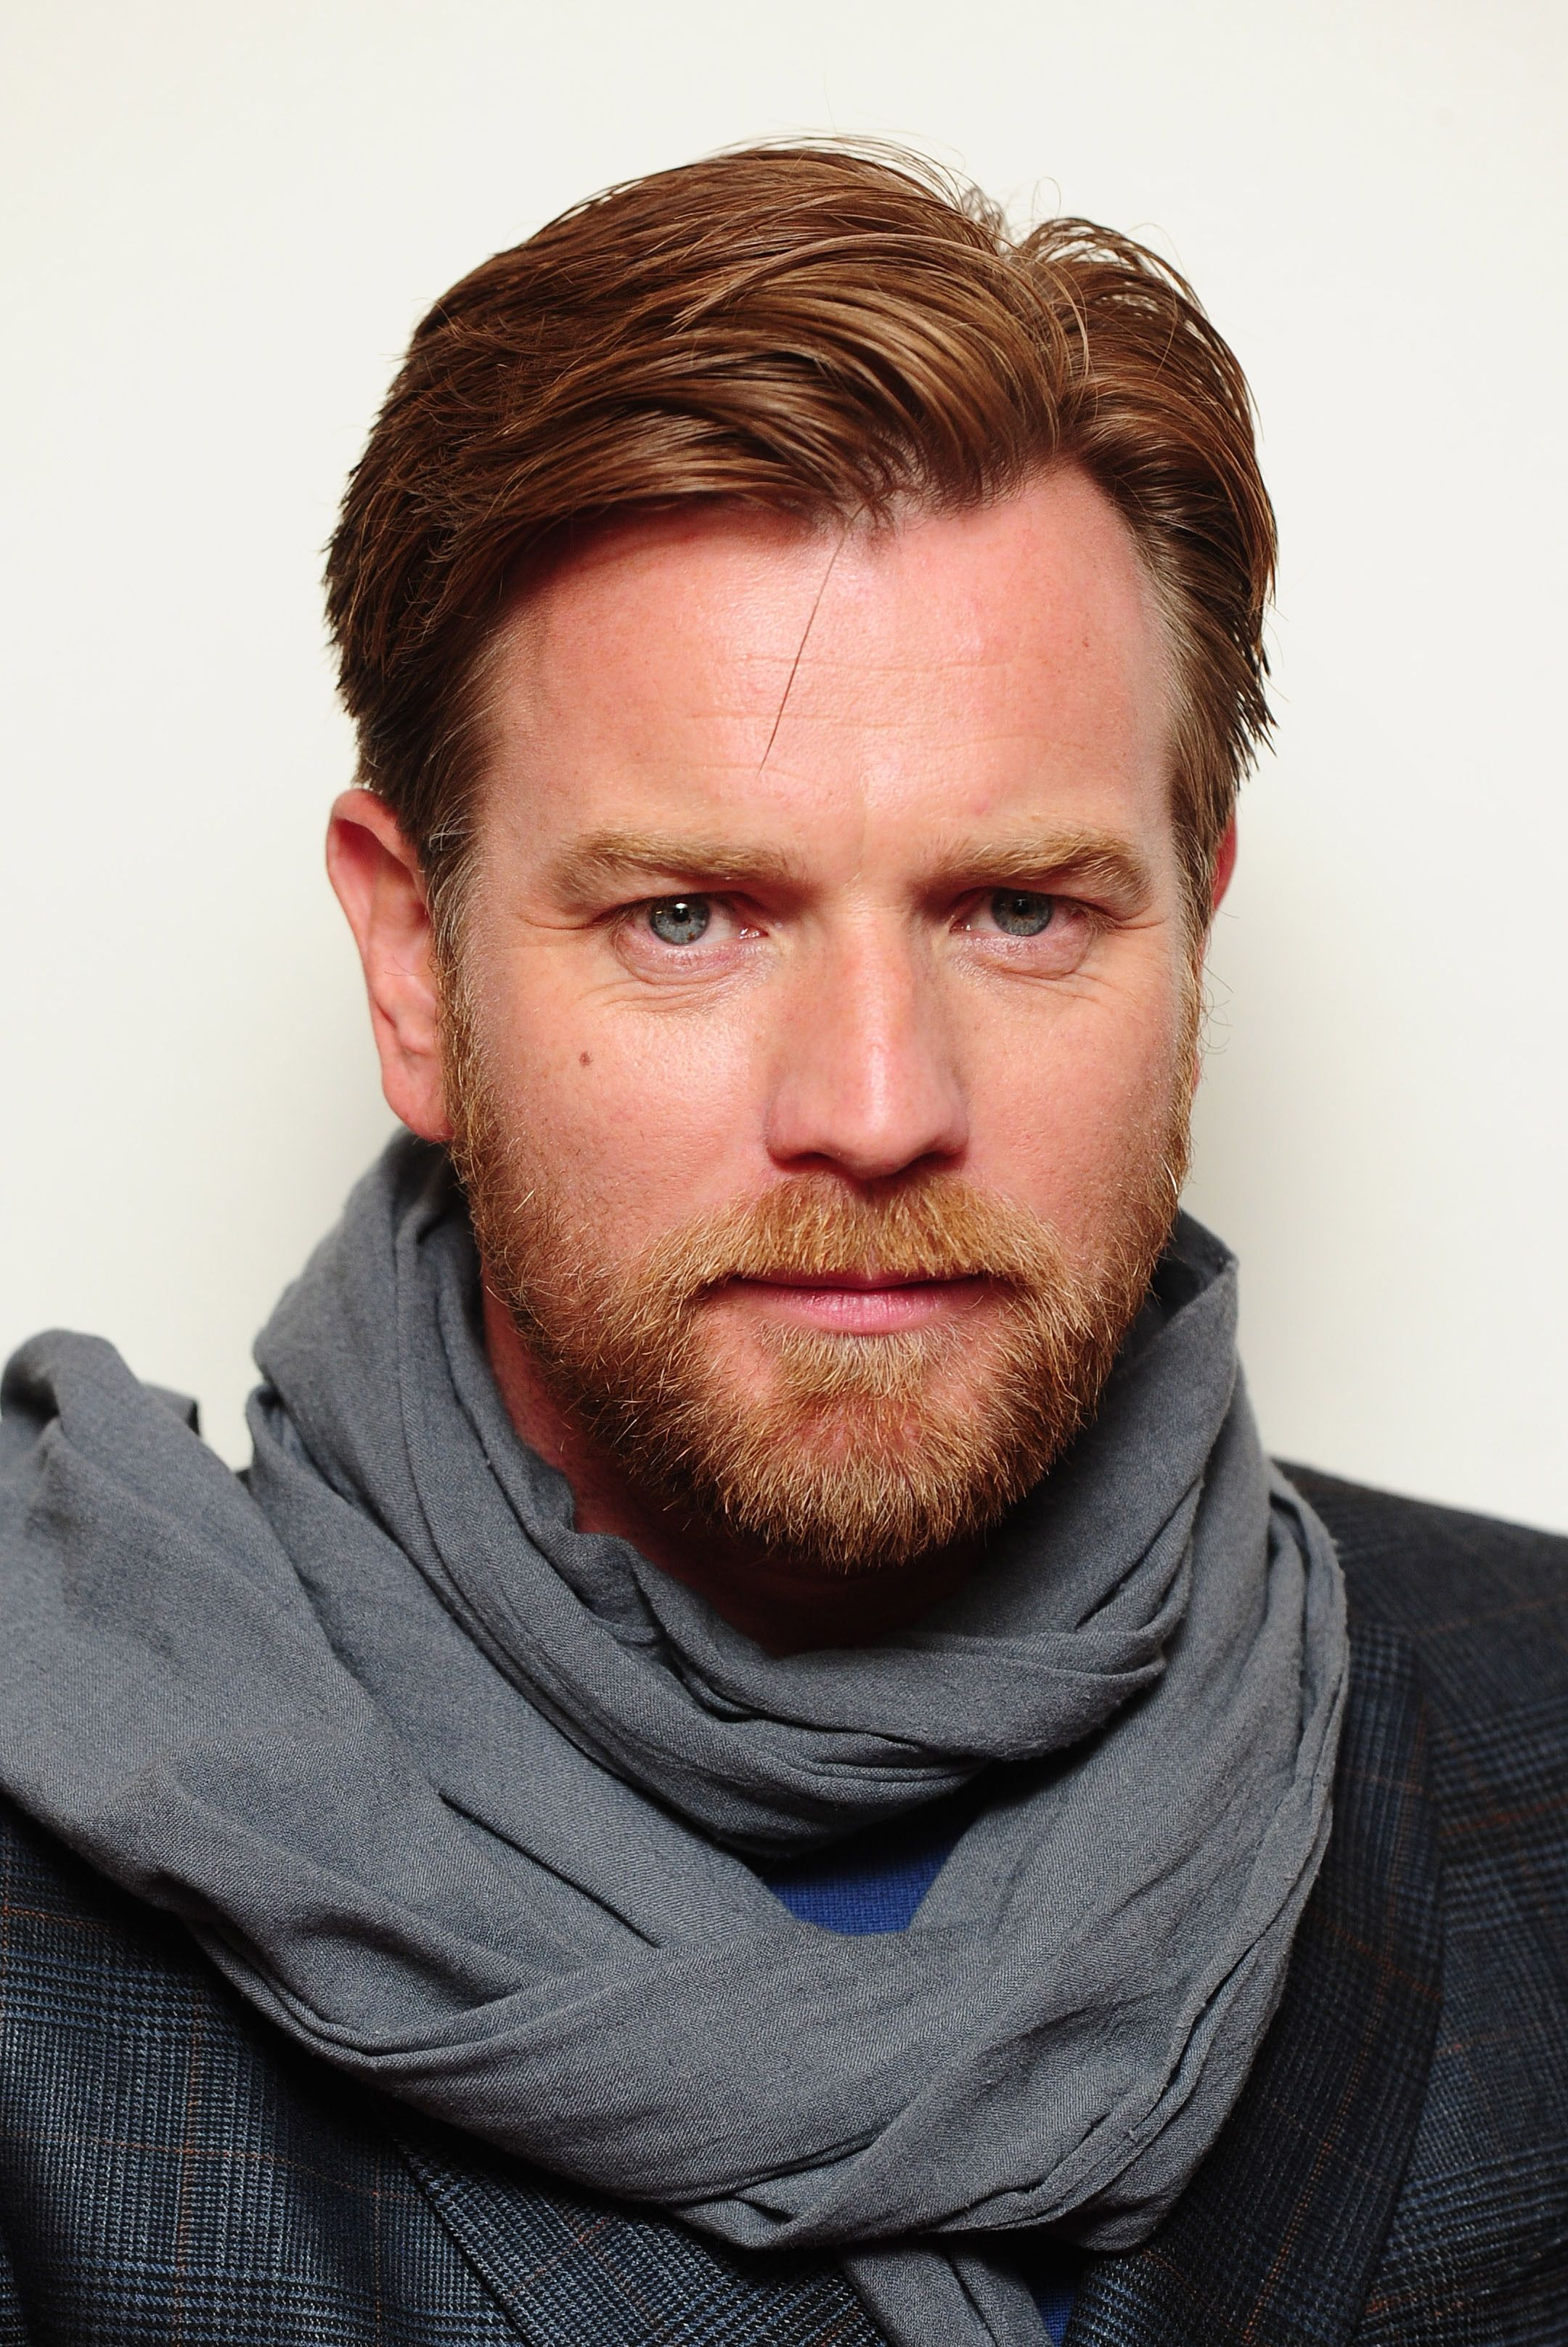 Sir Ewan Mcgregor 40ish Tortured Artist And Writer With The Worst Creative Block Imaginable Ewan Mcgregor Scottish Actors Ginger Men